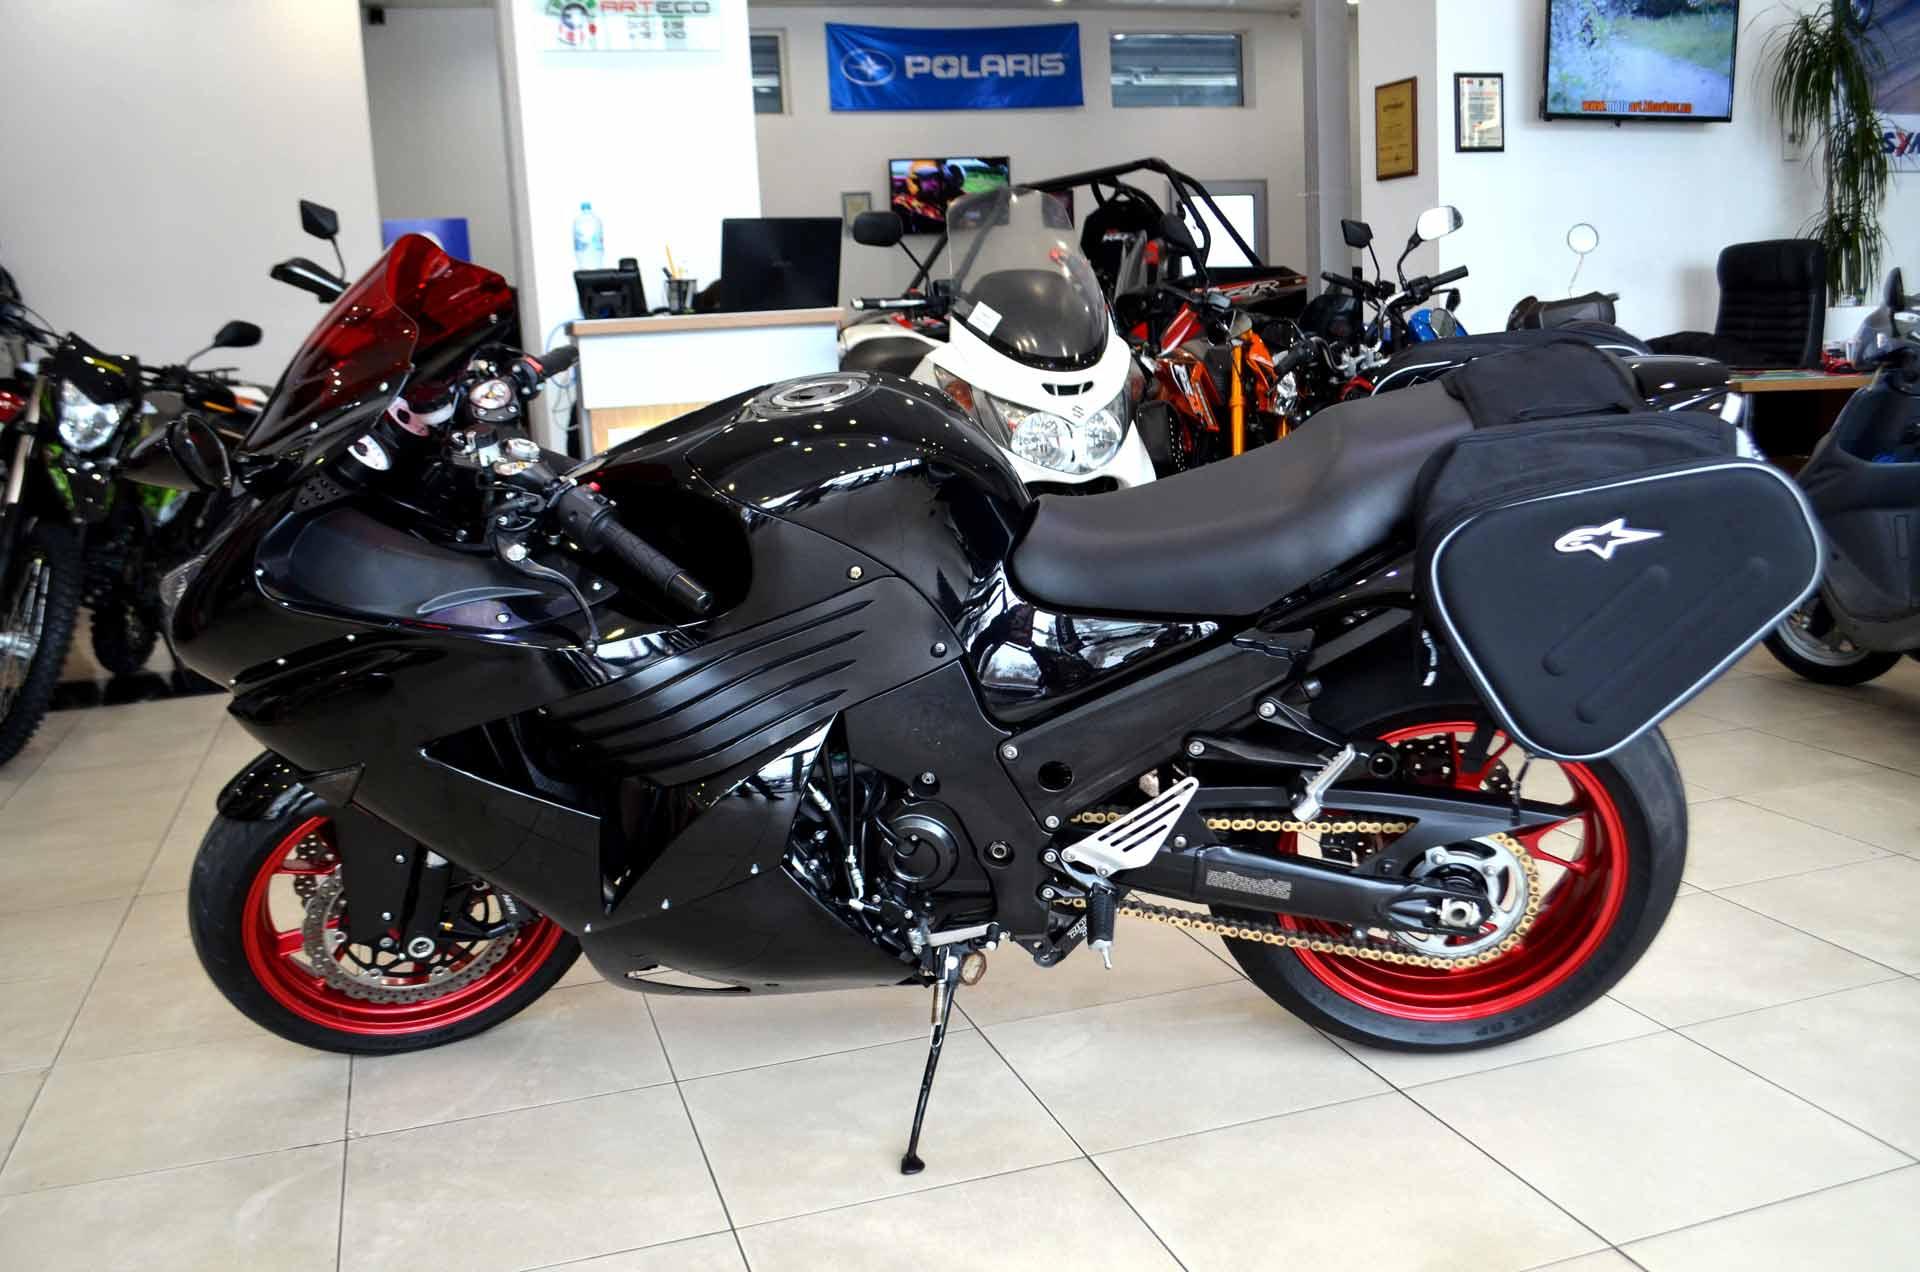 МОТОЦИКЛ KAWASAKI NINJA ZX-14 (ZZR 1400)  Артмото - купить квадроцикл в украине и харькове, мотоцикл, снегоход, скутер, мопед, электромобиль